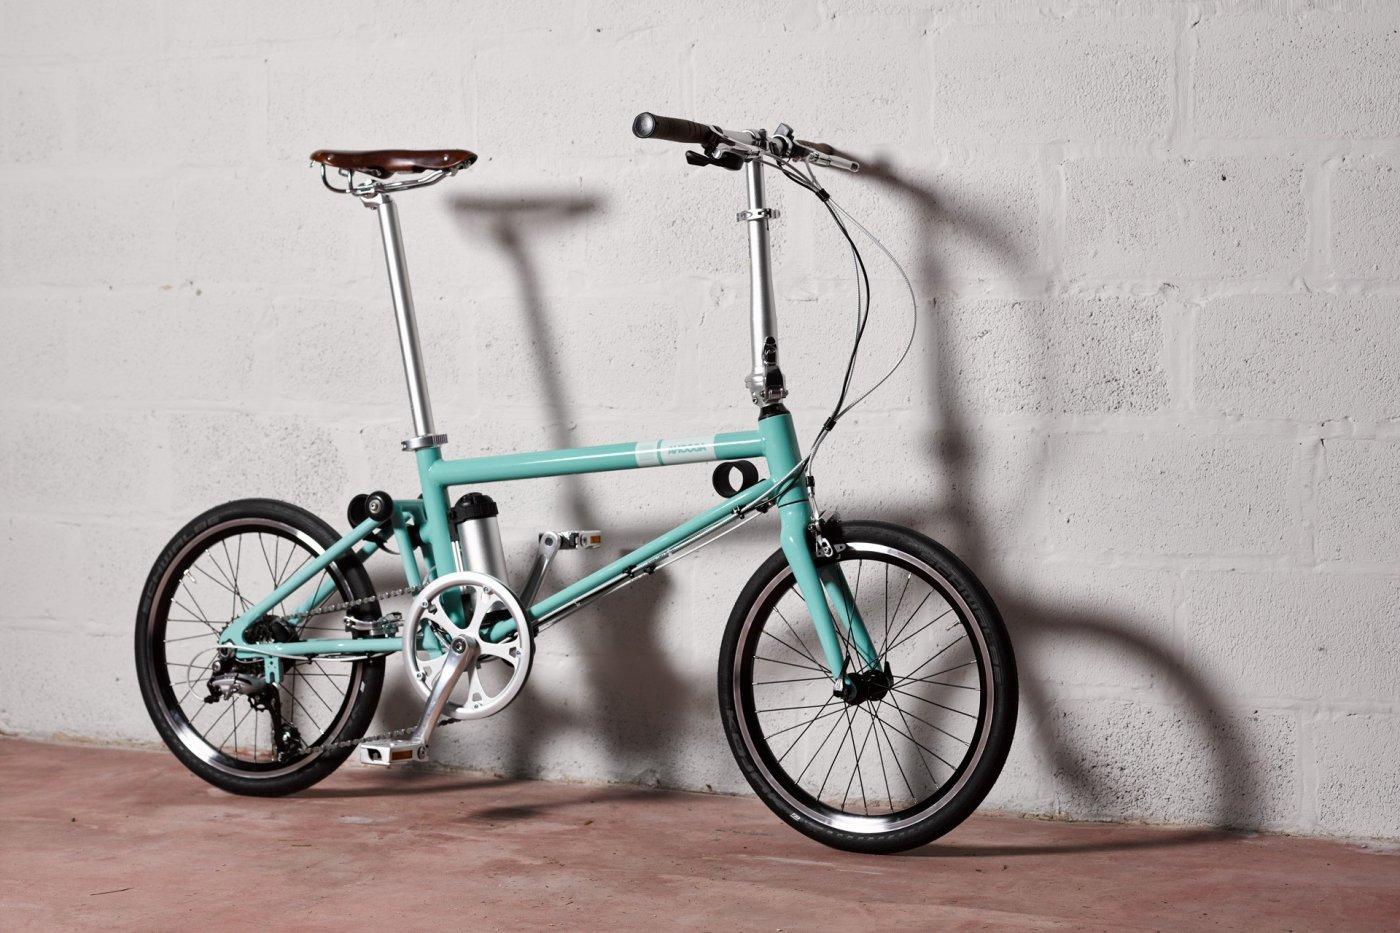 ahooga-hybrid-bike-je-suis-je-conduis